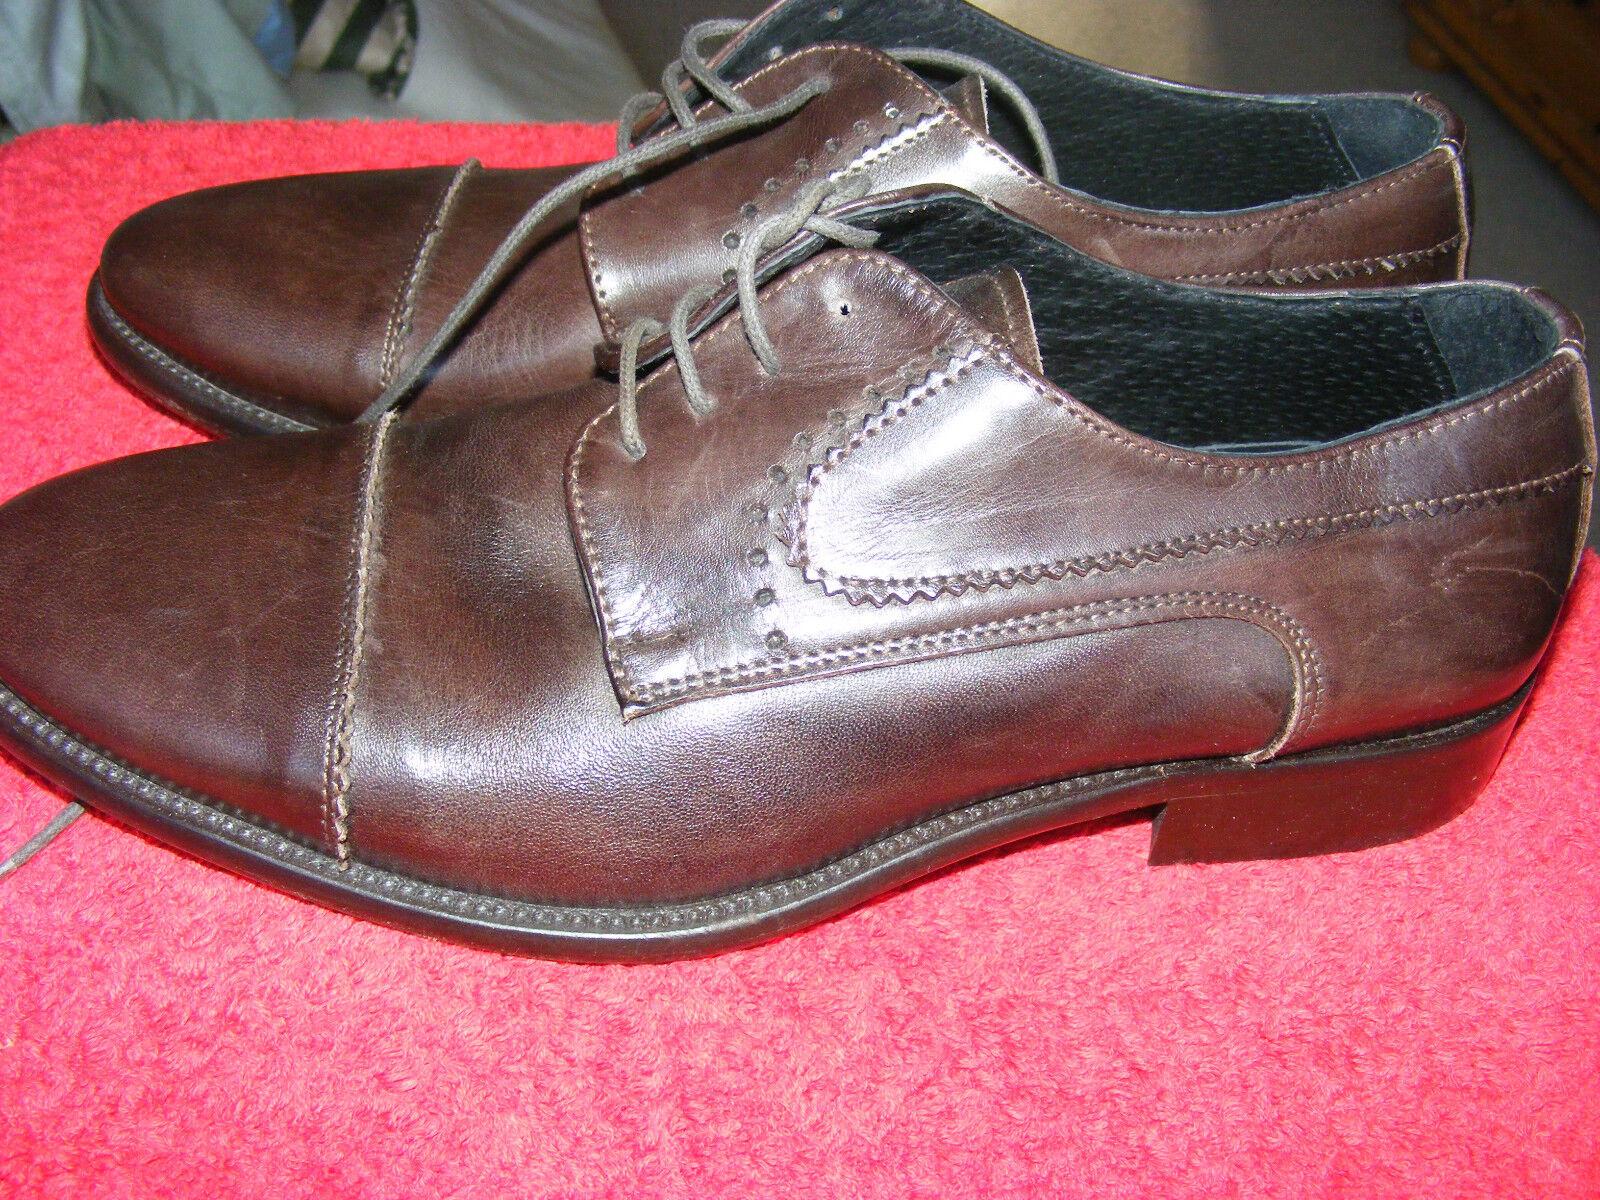 Gr. 42 braune Schnürschuhe Halbschuhe braun + NEU + Leder